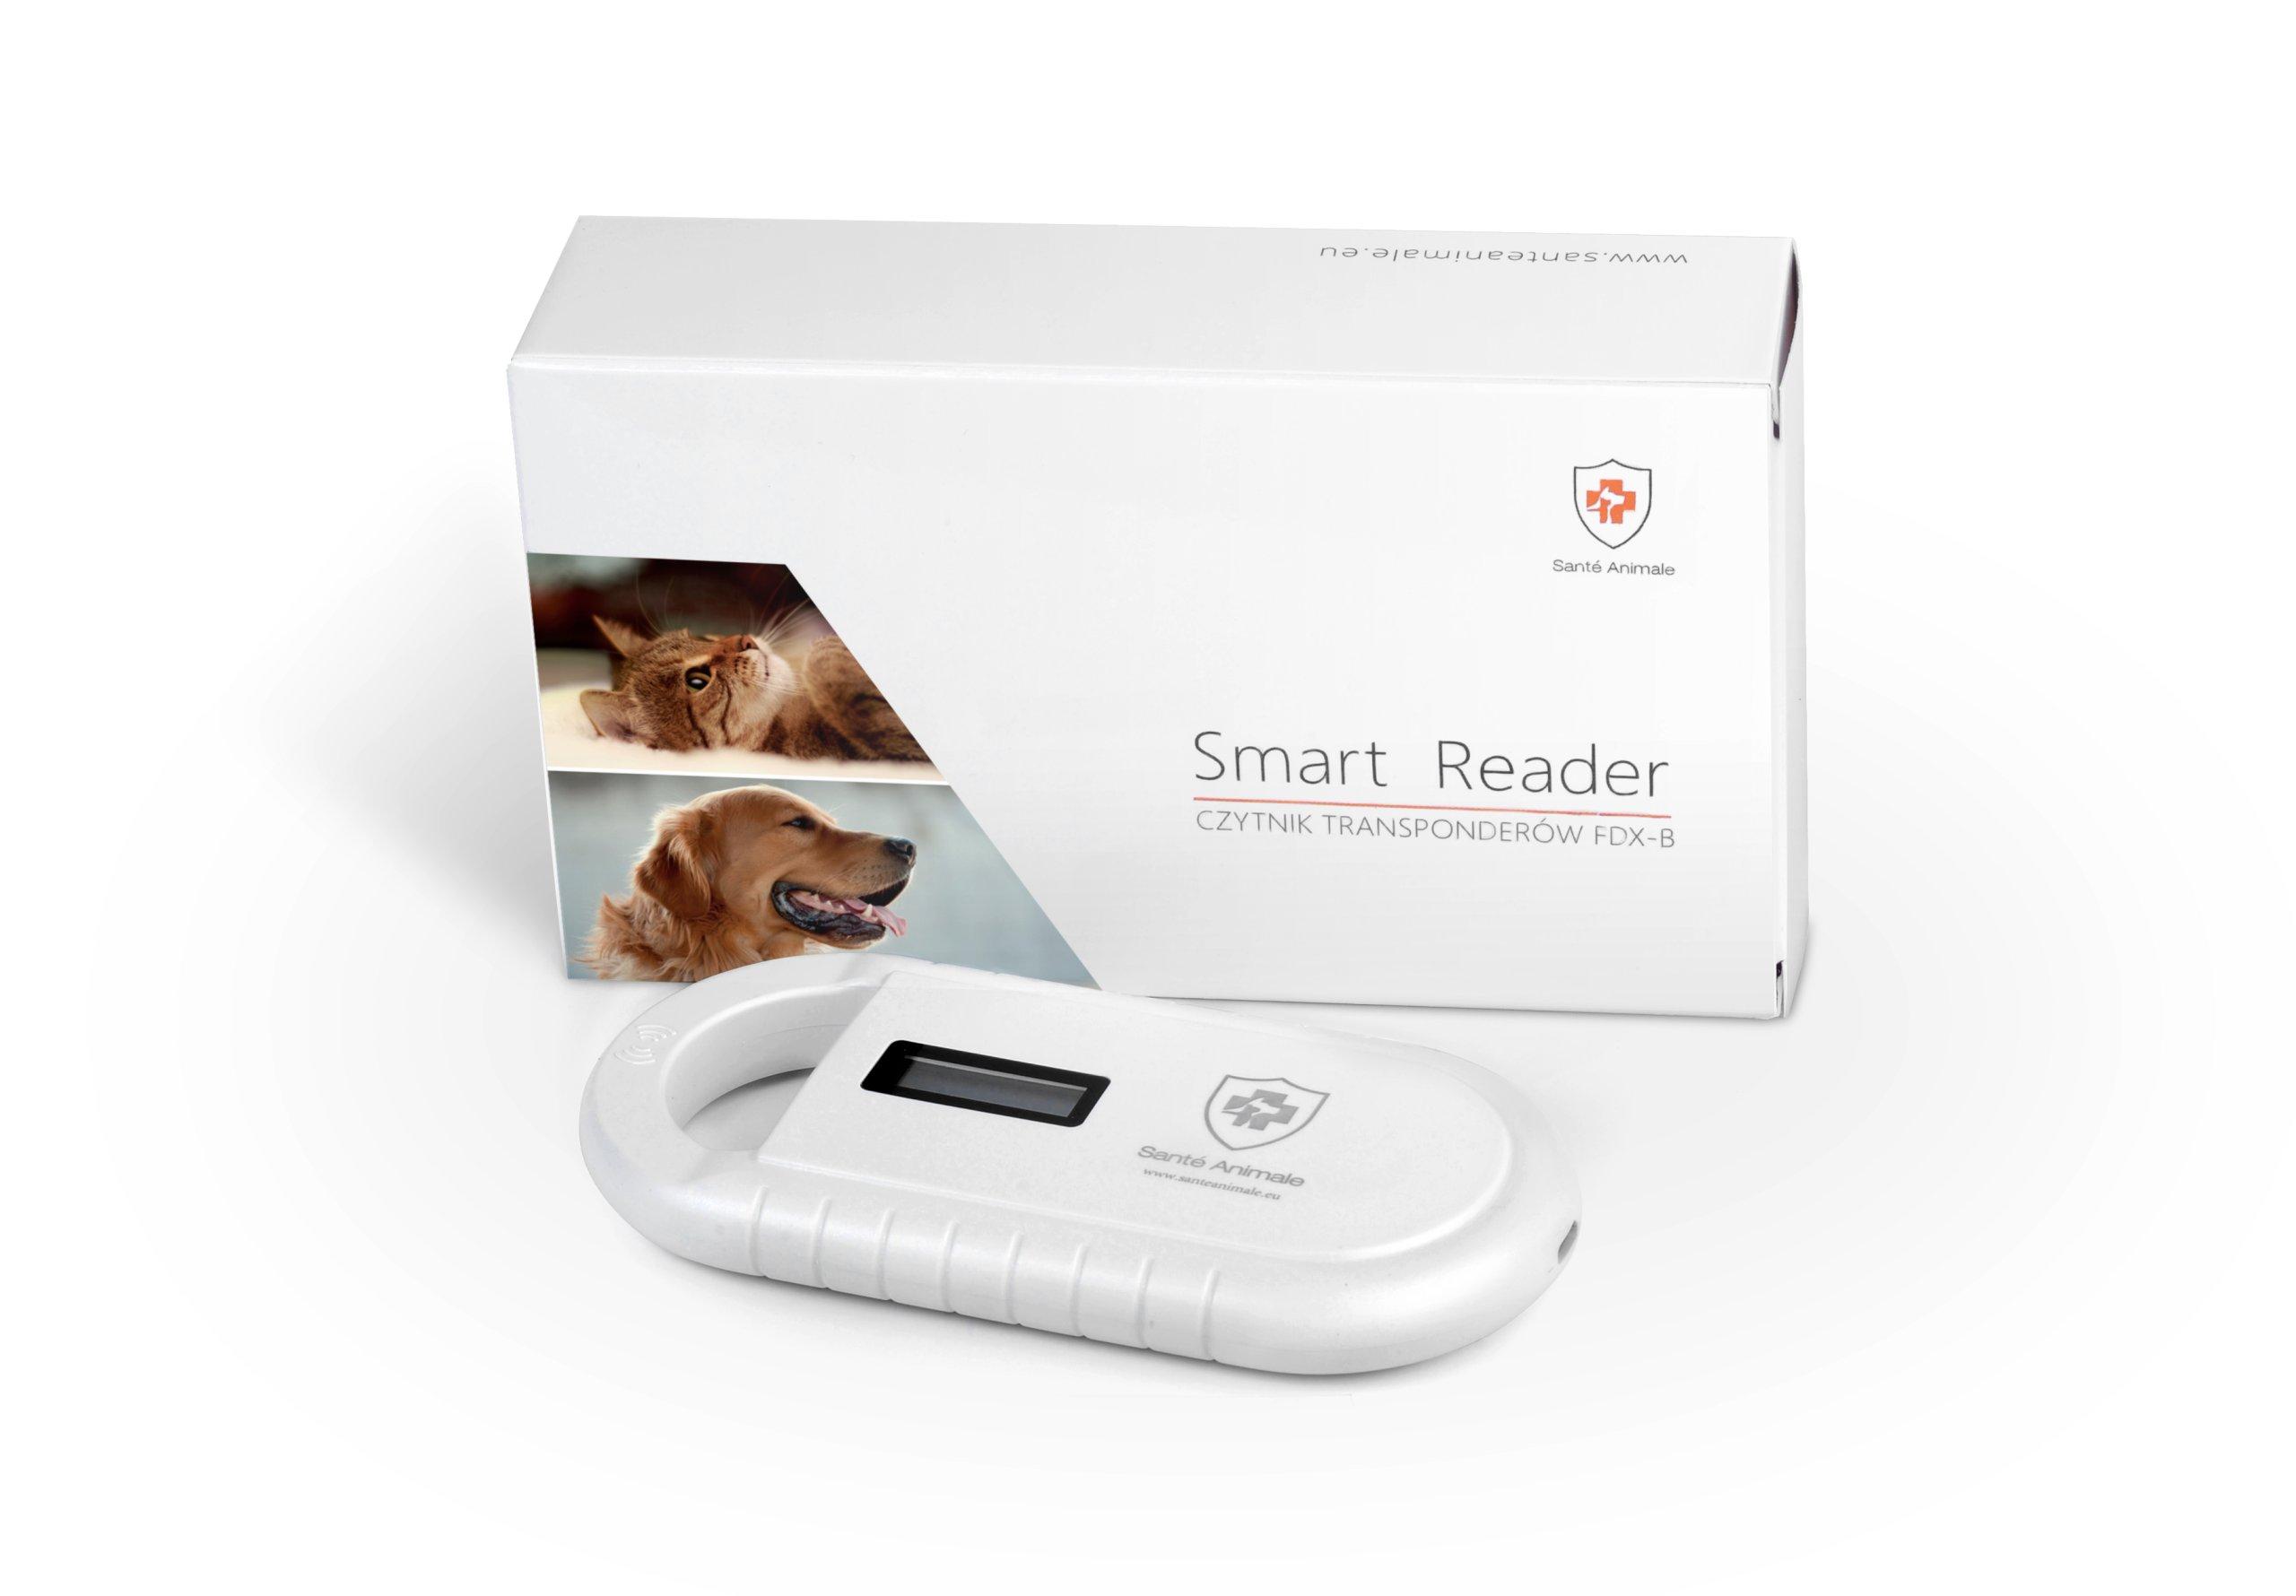 Czytnik mikrochipów SMART READER - super cena